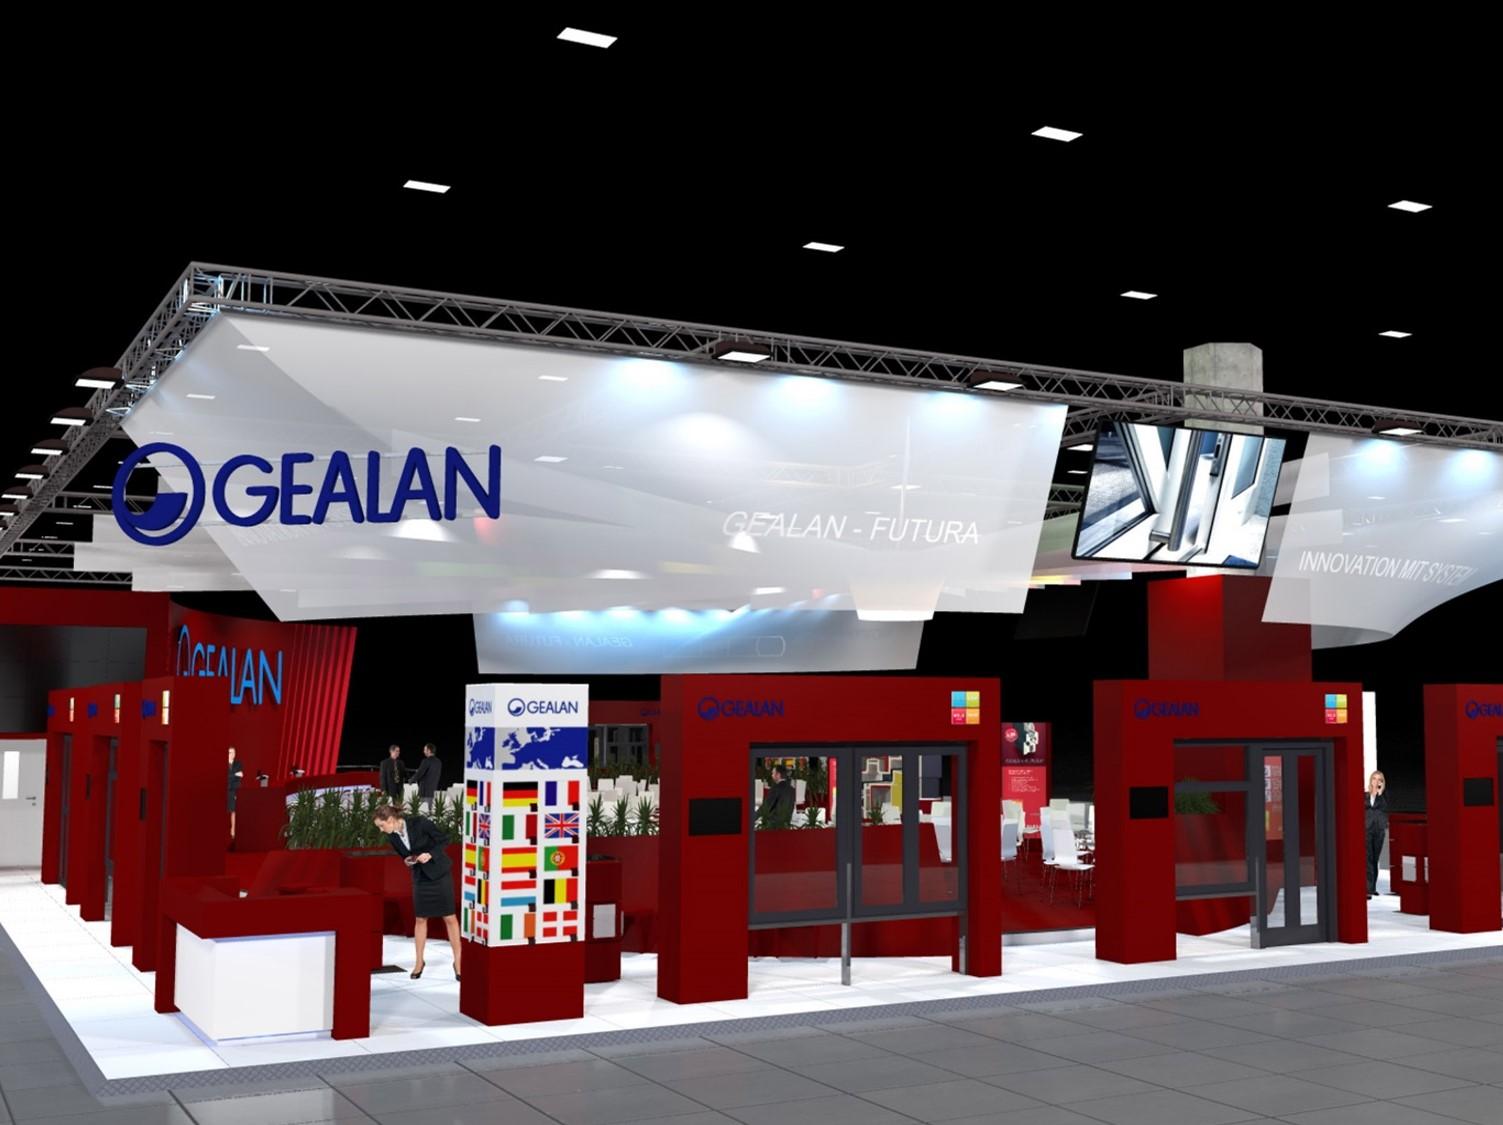 Noul sistem complet din sticla GEALAN-KUBUS® prezentat la targul FENSTERBAU FRONTALE 2016 - Noul sistem complet